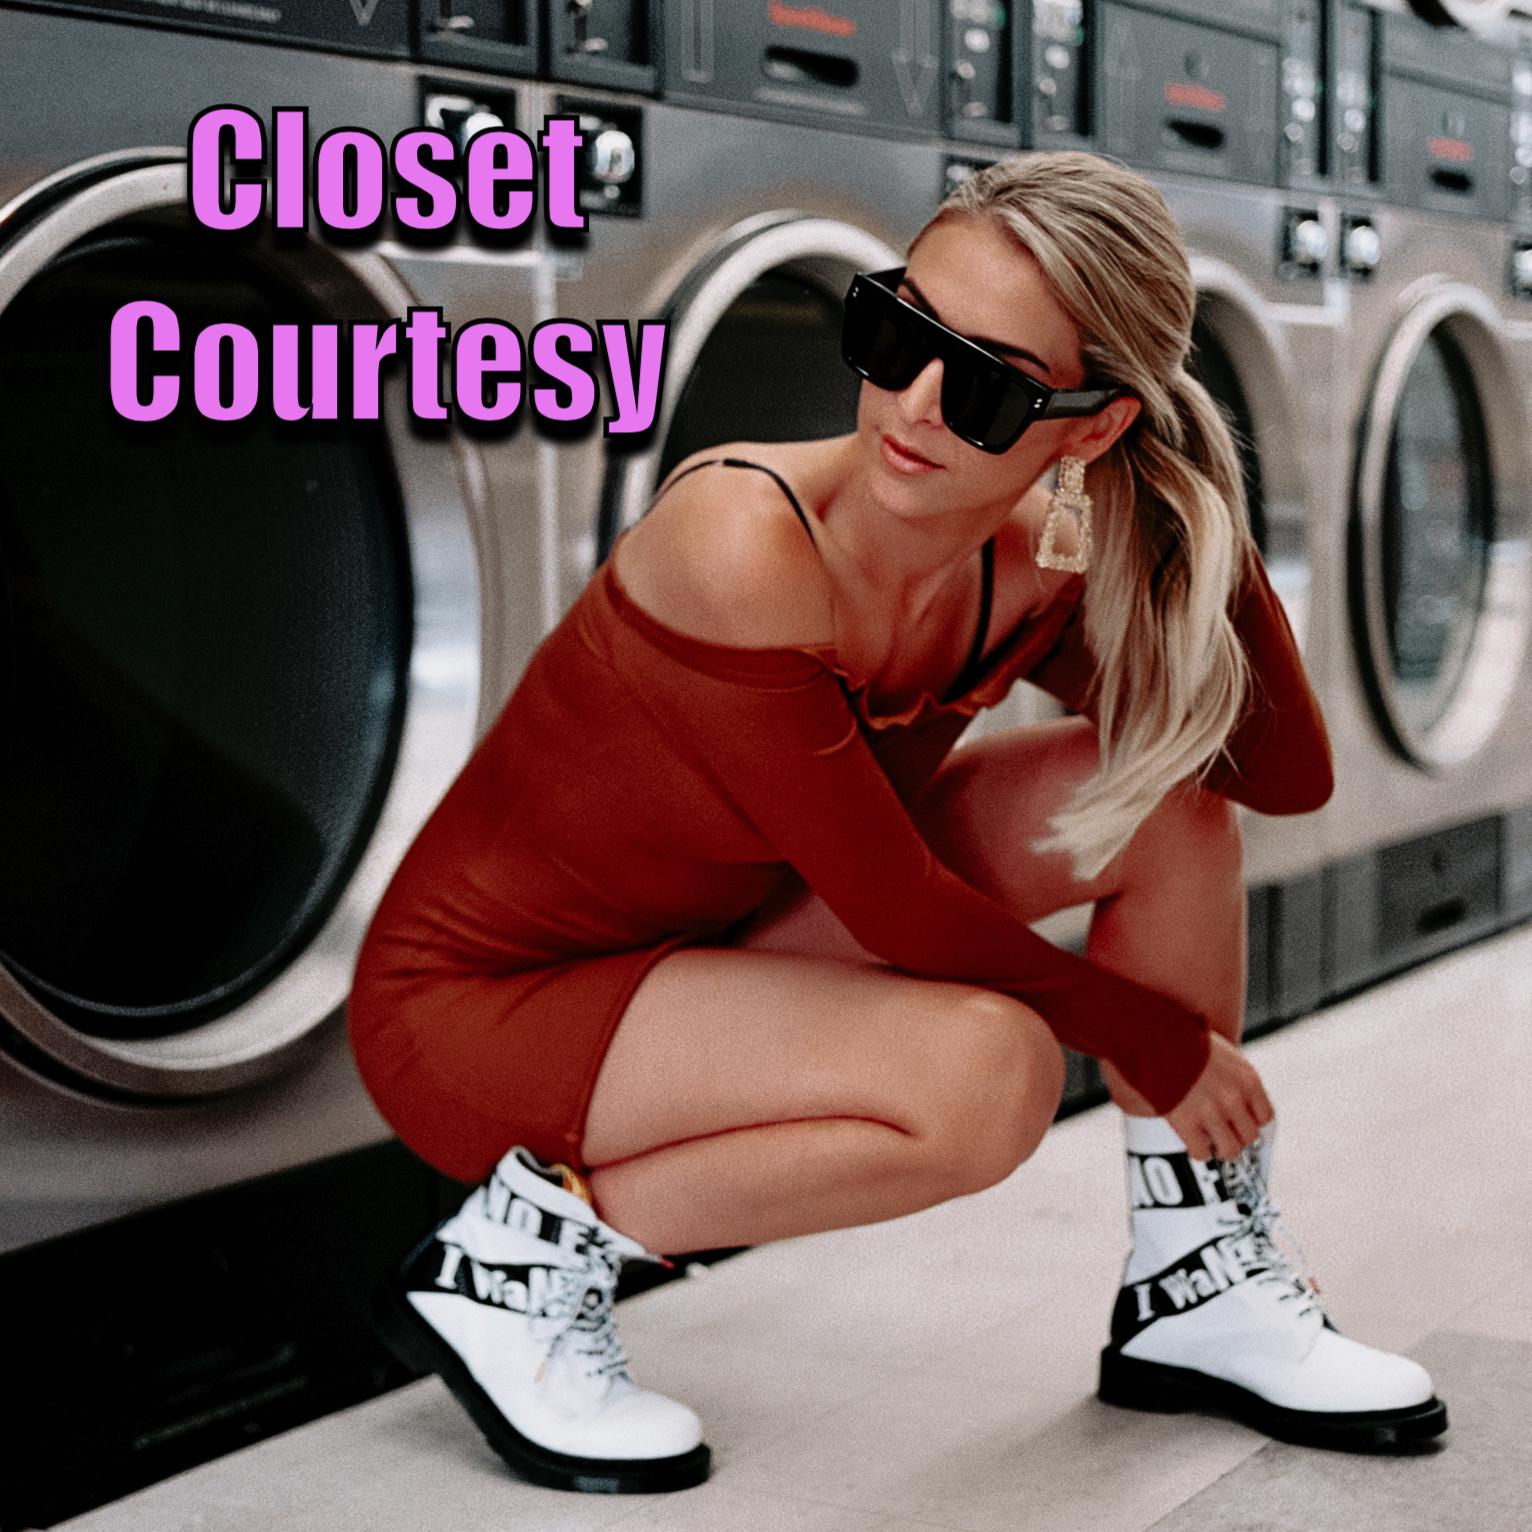 Closet-Courtesy.jpg